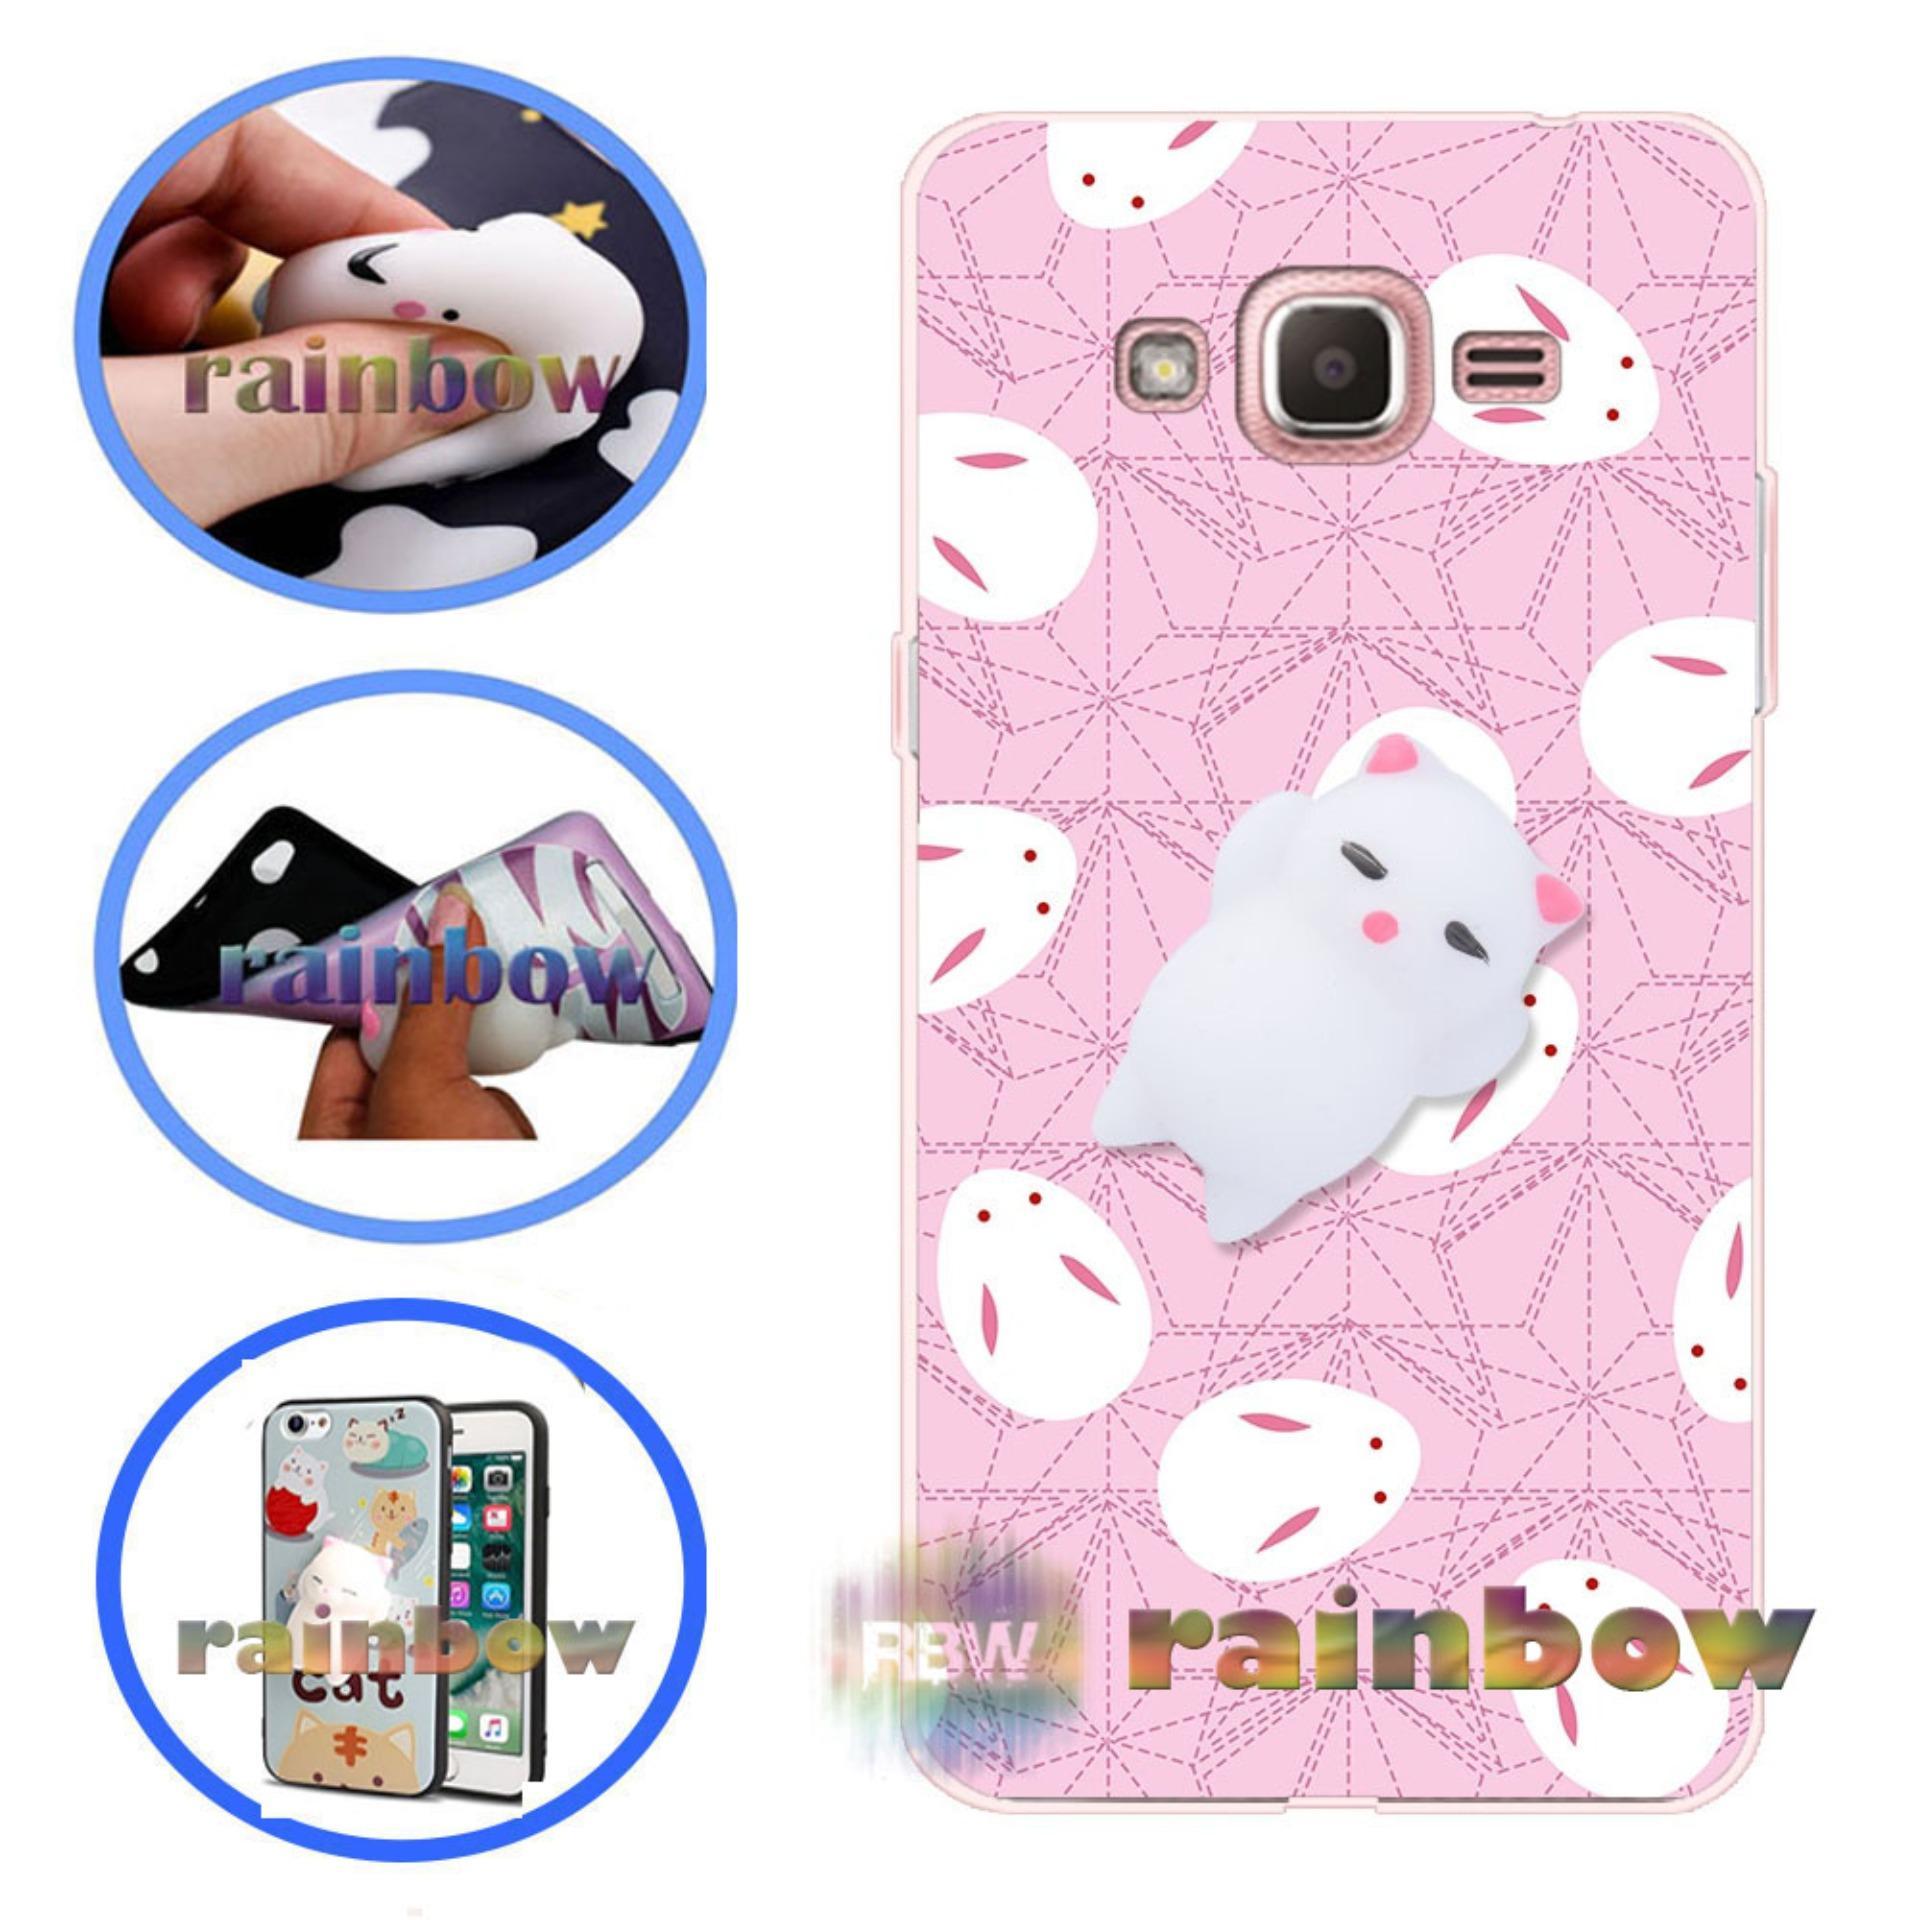 Cek Harga Baru Rainbow Squishy Case Samsung J2 Prime Softcase Silicon 3d Kartun Mungil Lucu Galaxy Rabbit Mozaik Custom Squeeze